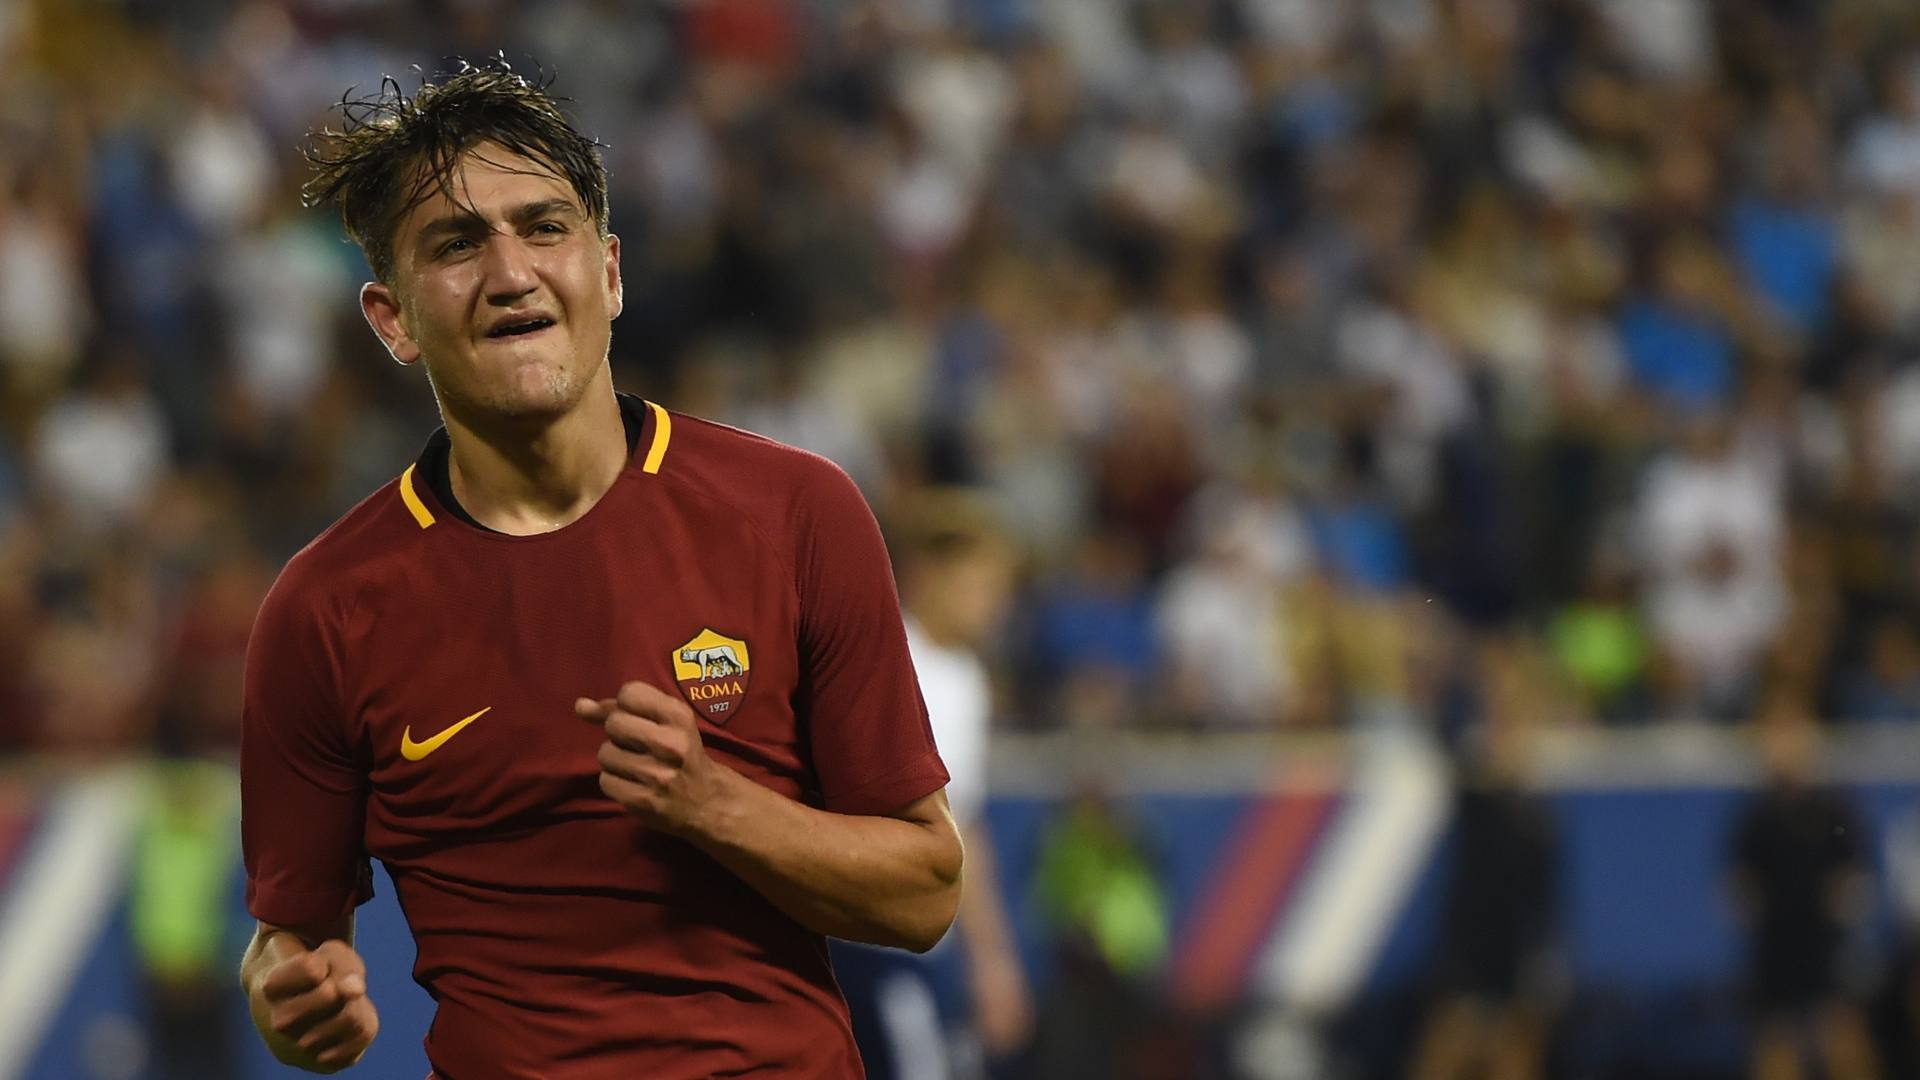 Roma İnter Maçı İddaa Tahmini ve Yorumu 26.8.2017